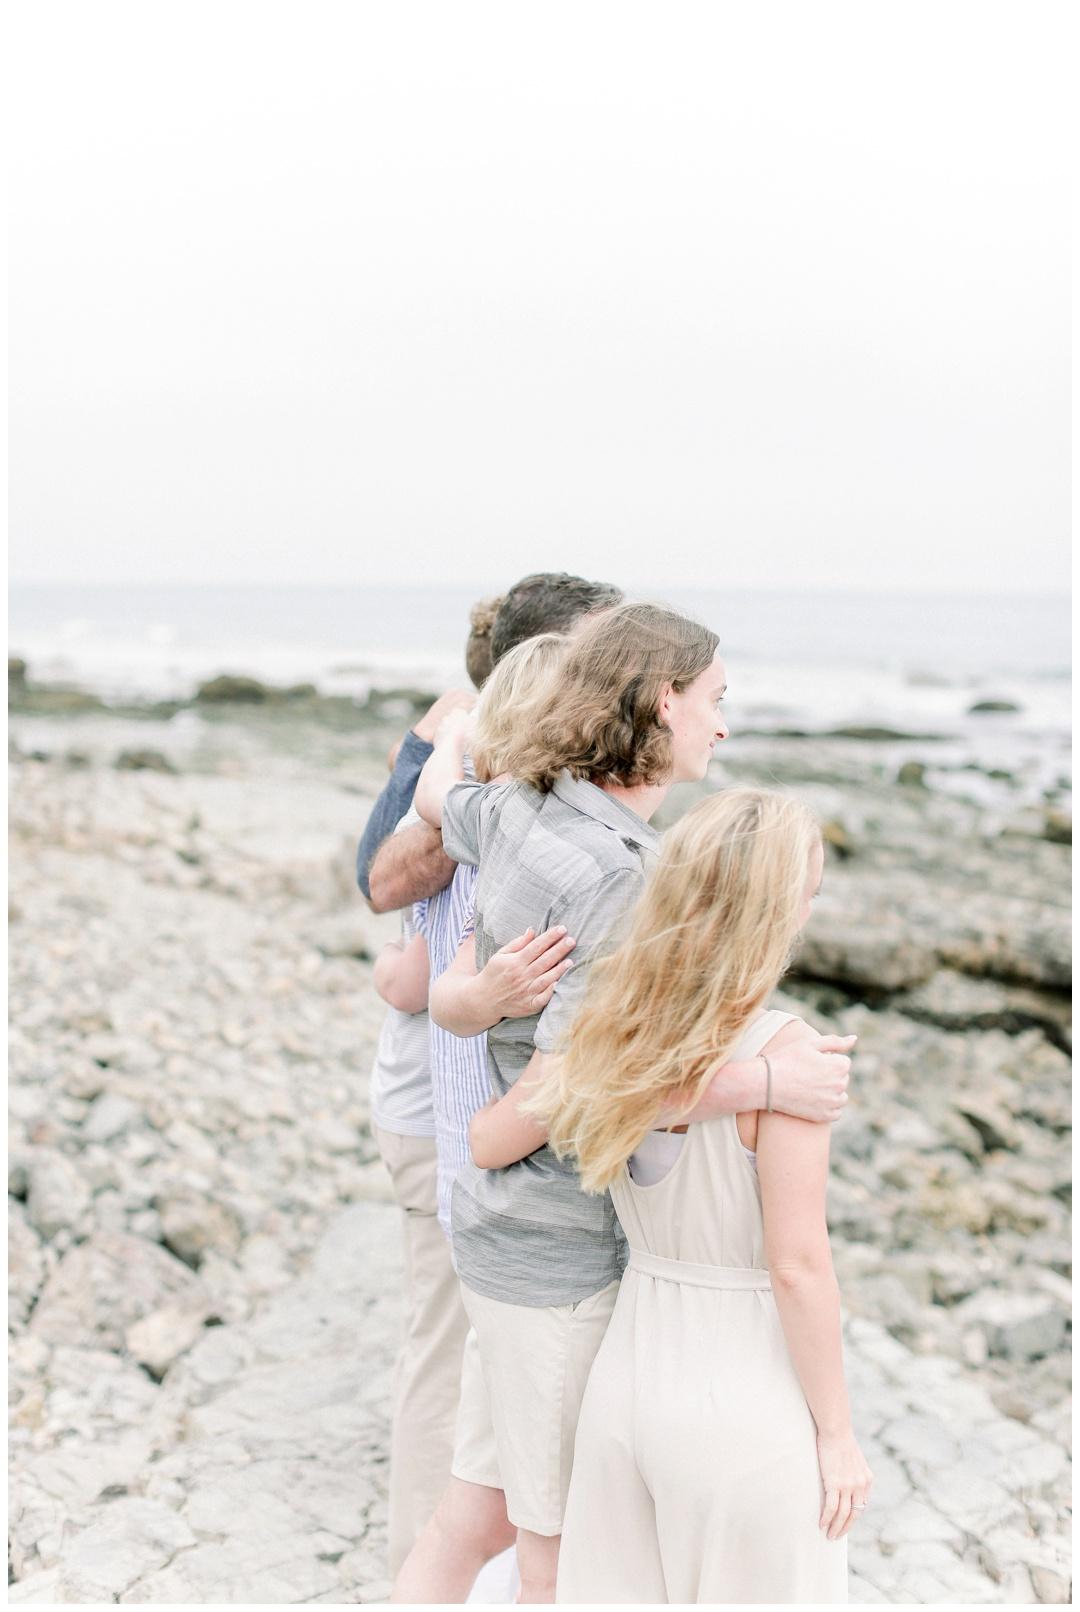 Newport_Beach_Family_Photographer_Orange_County_Family_Photography_Cori_Kleckner_Photography_Orange_County_Family_Photographer_Beach_Family_Session__1221.jpg